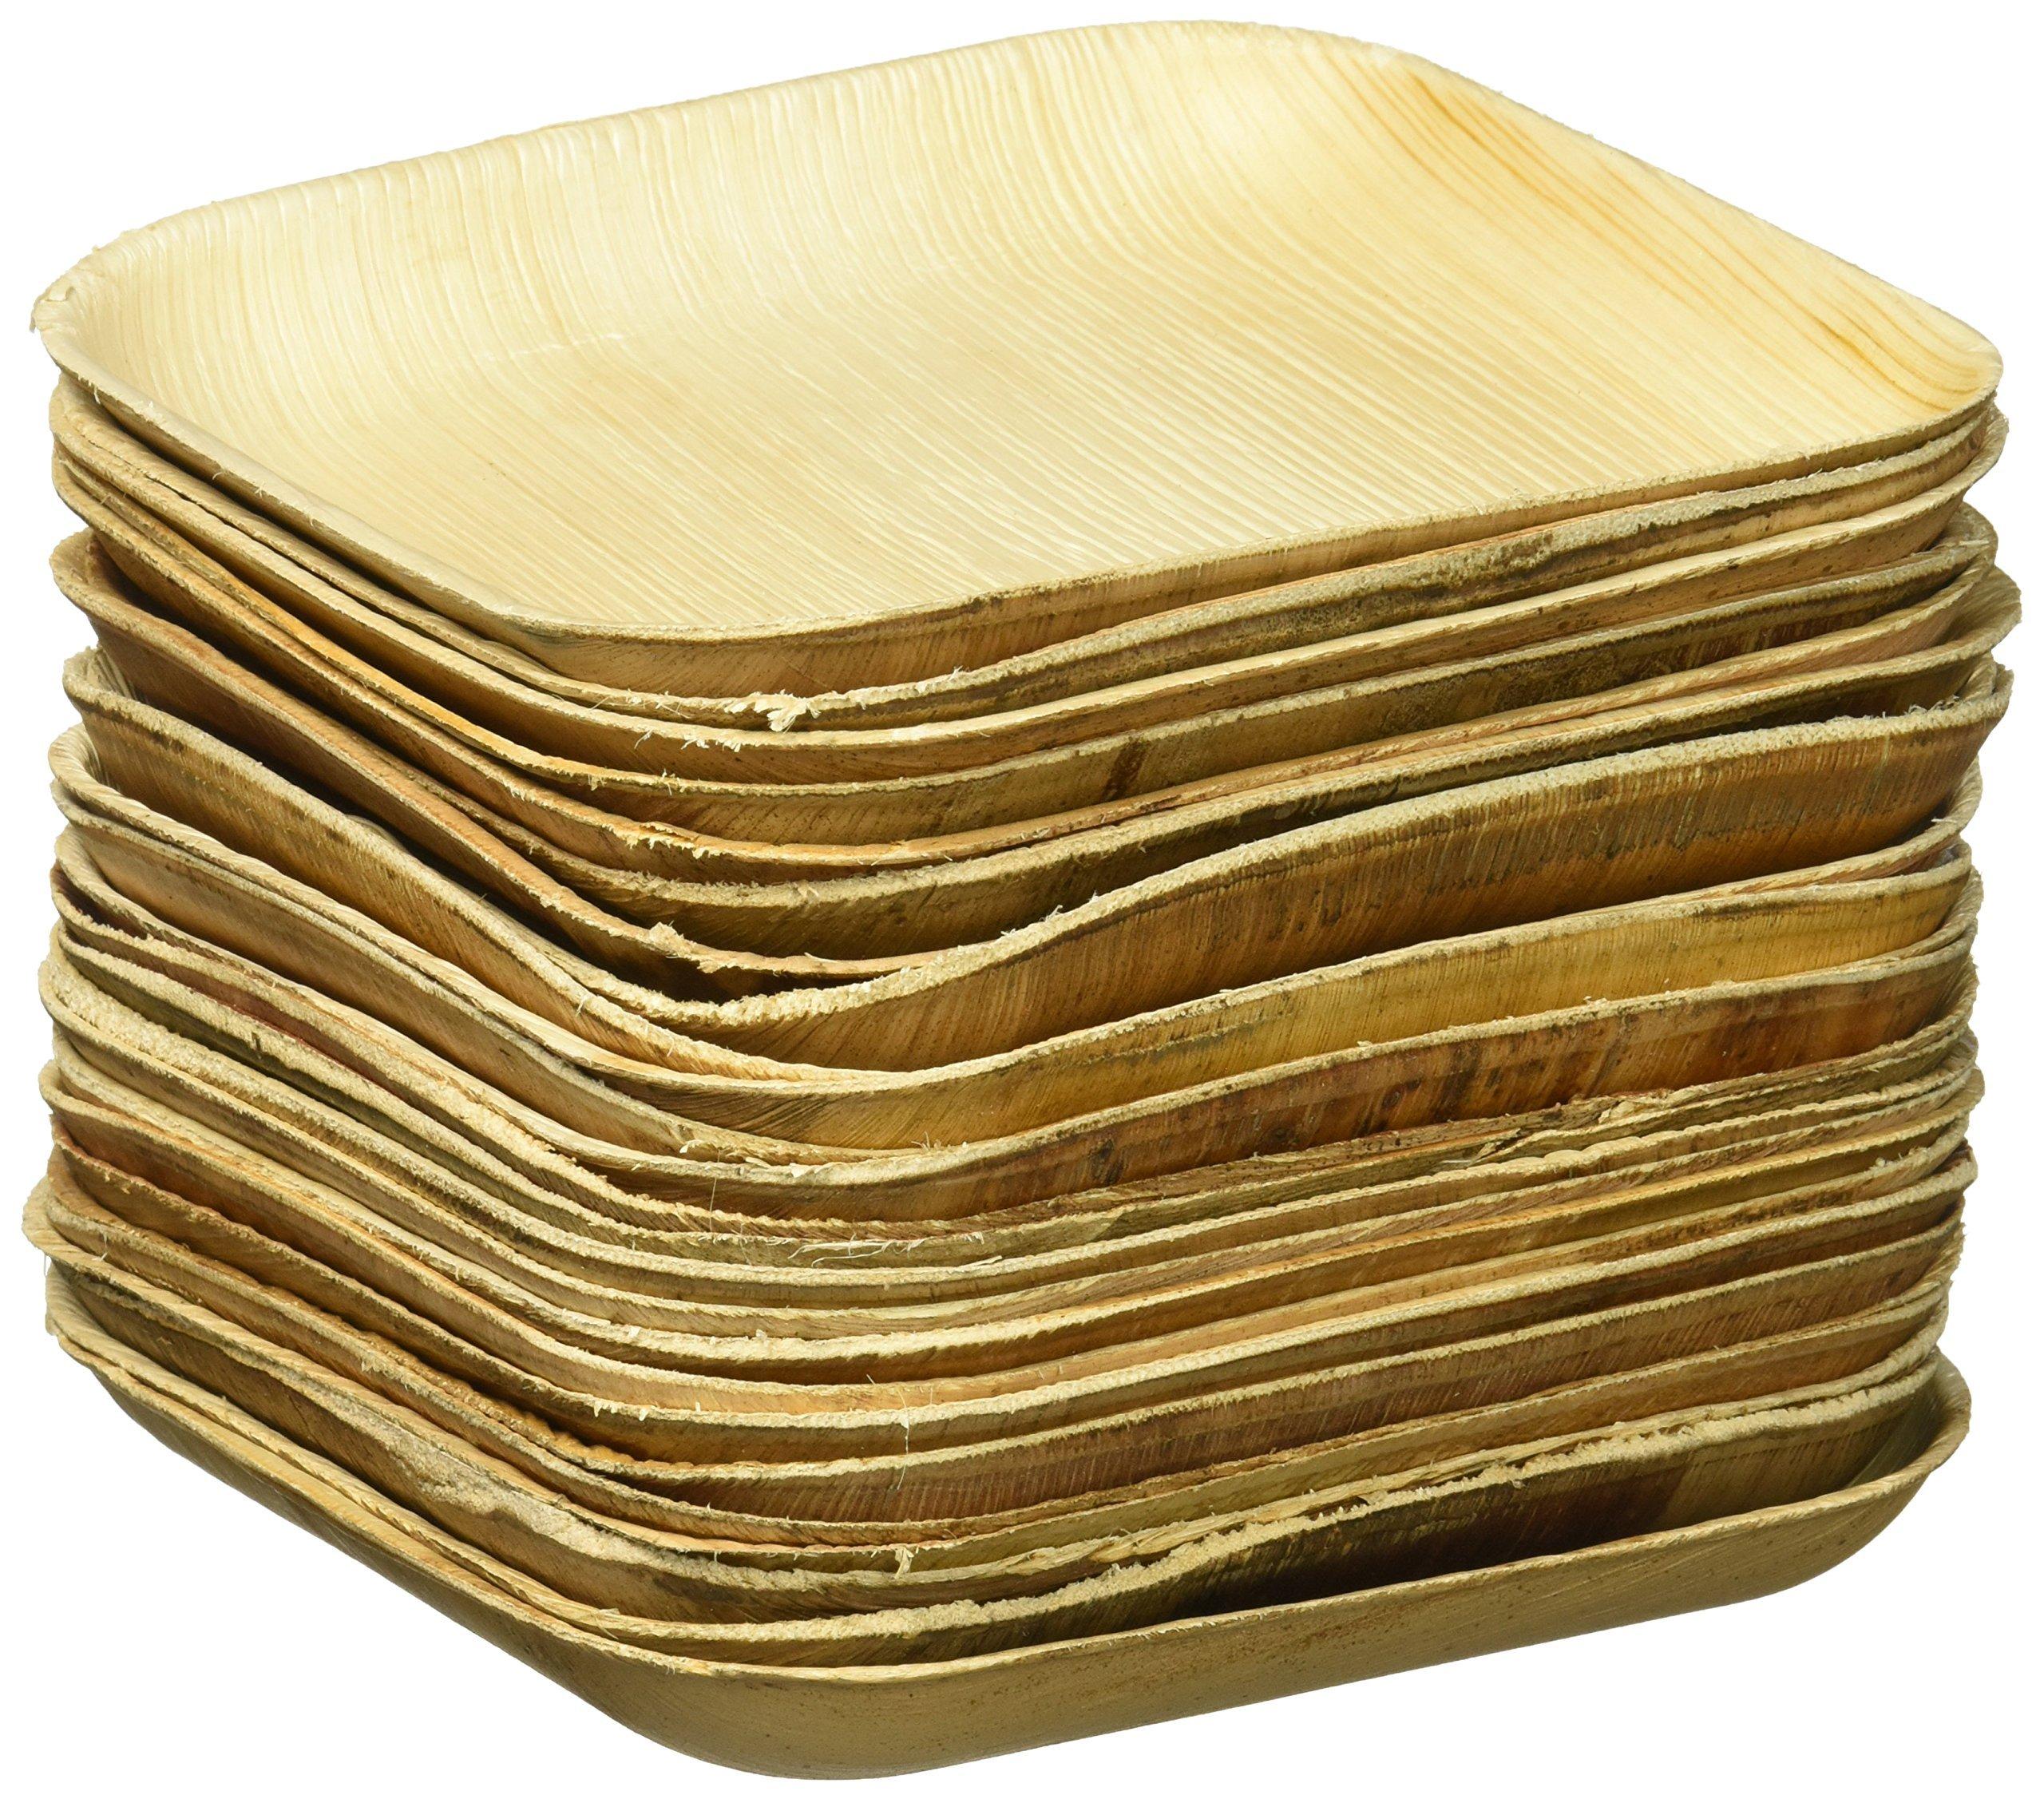 VerTerra 6  x 6  Square Palm Leaf Plates - Compostable Dinnerware - Appetizer and  sc 1 st  Amazon.com & Amazon.com | Verterra Compostable Dinnerware 8